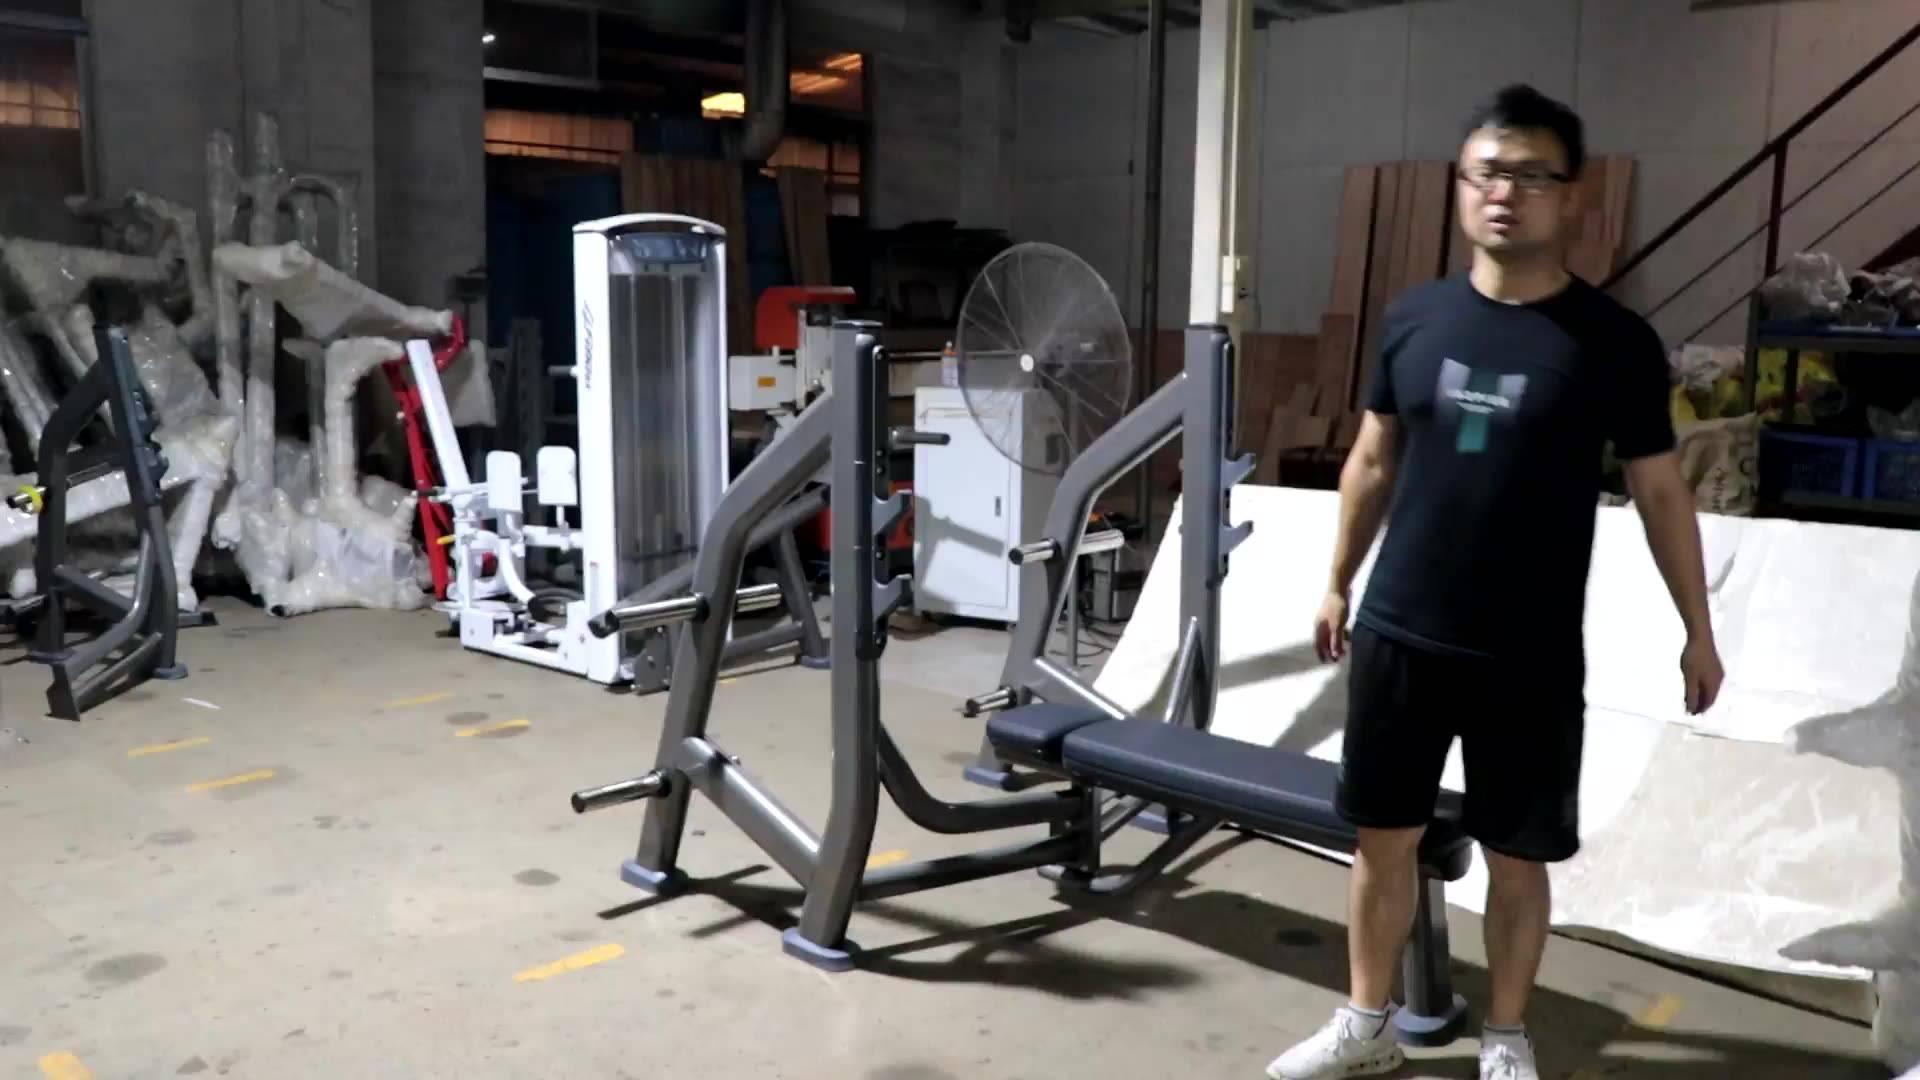 LJ-5125 Olympic bench weight storage